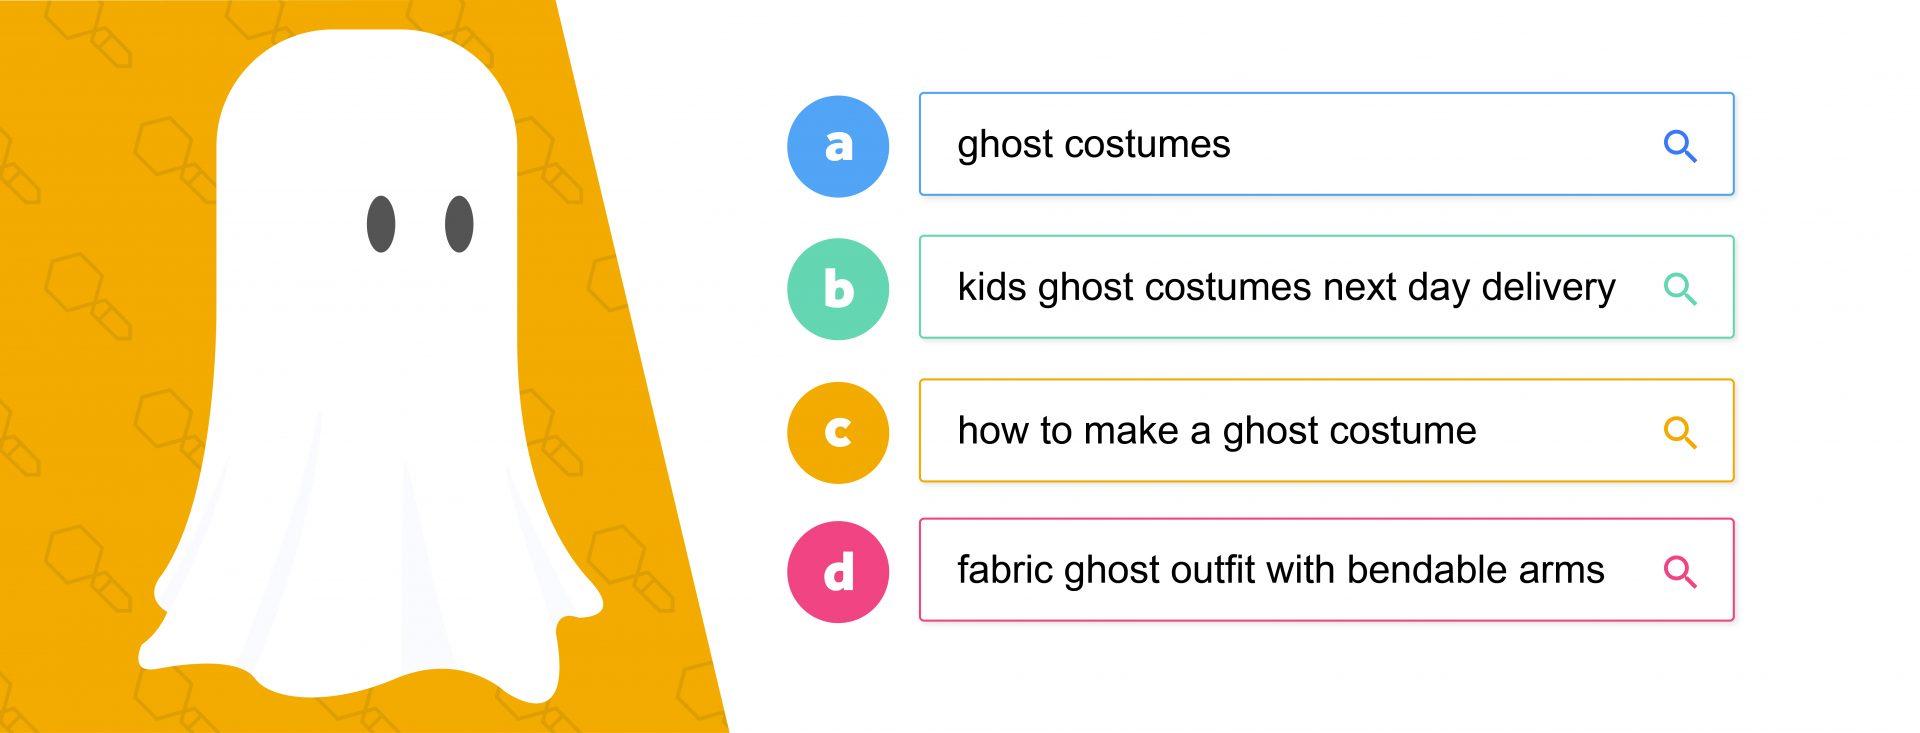 Ghost costume keywords